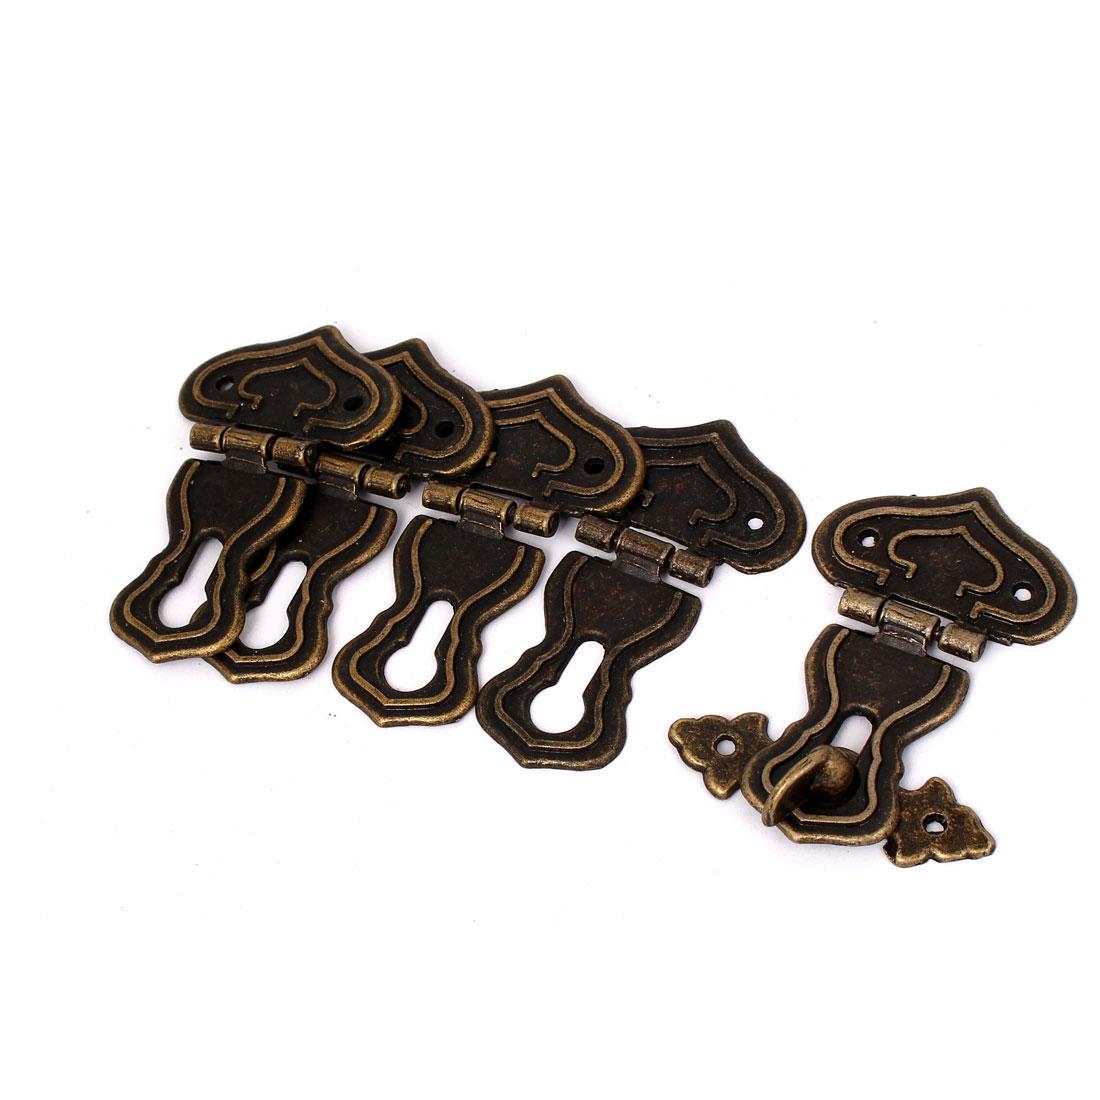 63mmx48mm Vintage Style Wooden Box Case Hook Lock Lid Latch Bronze Tone 5pcs